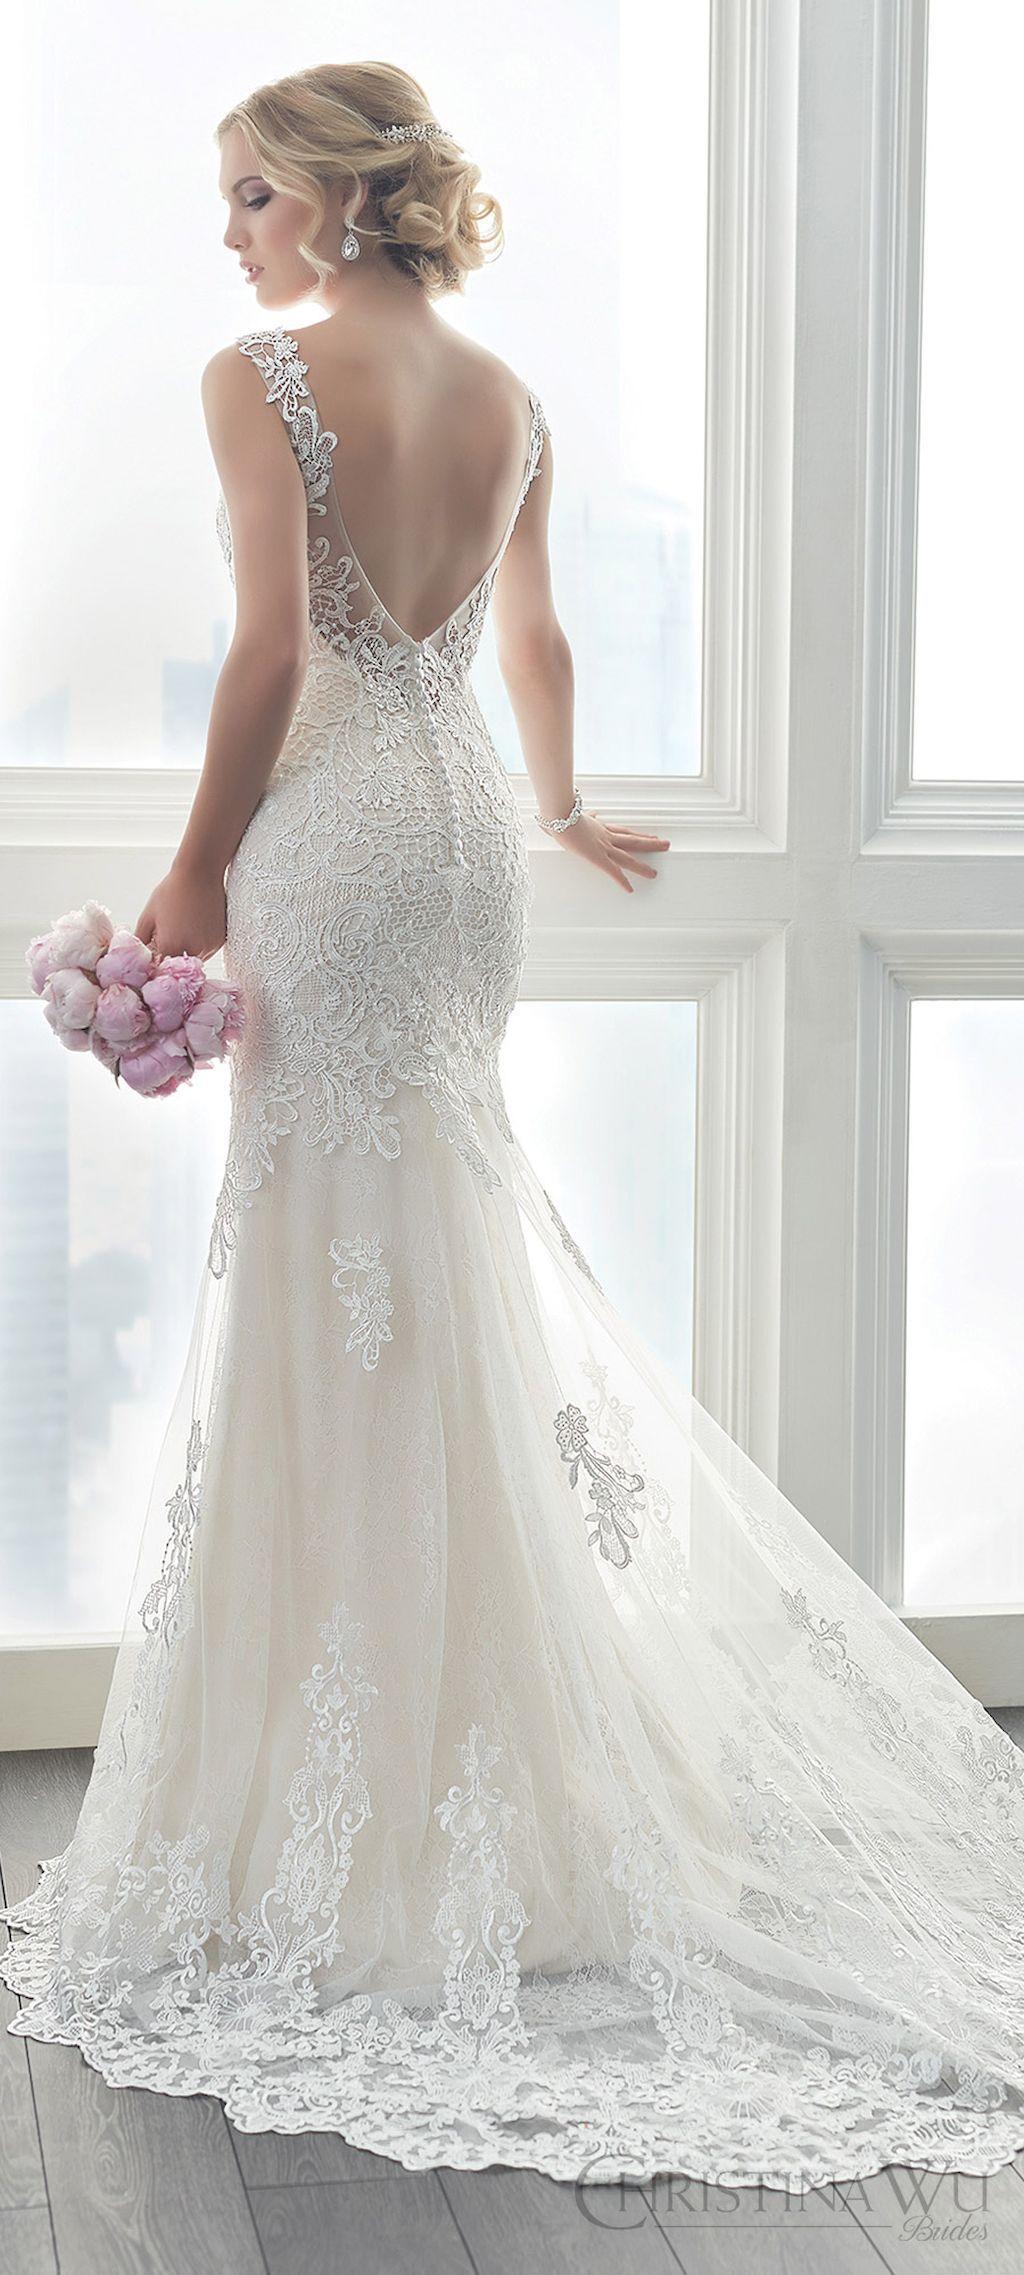 Pin by carla palm on trourokke pinterest wedding dresses